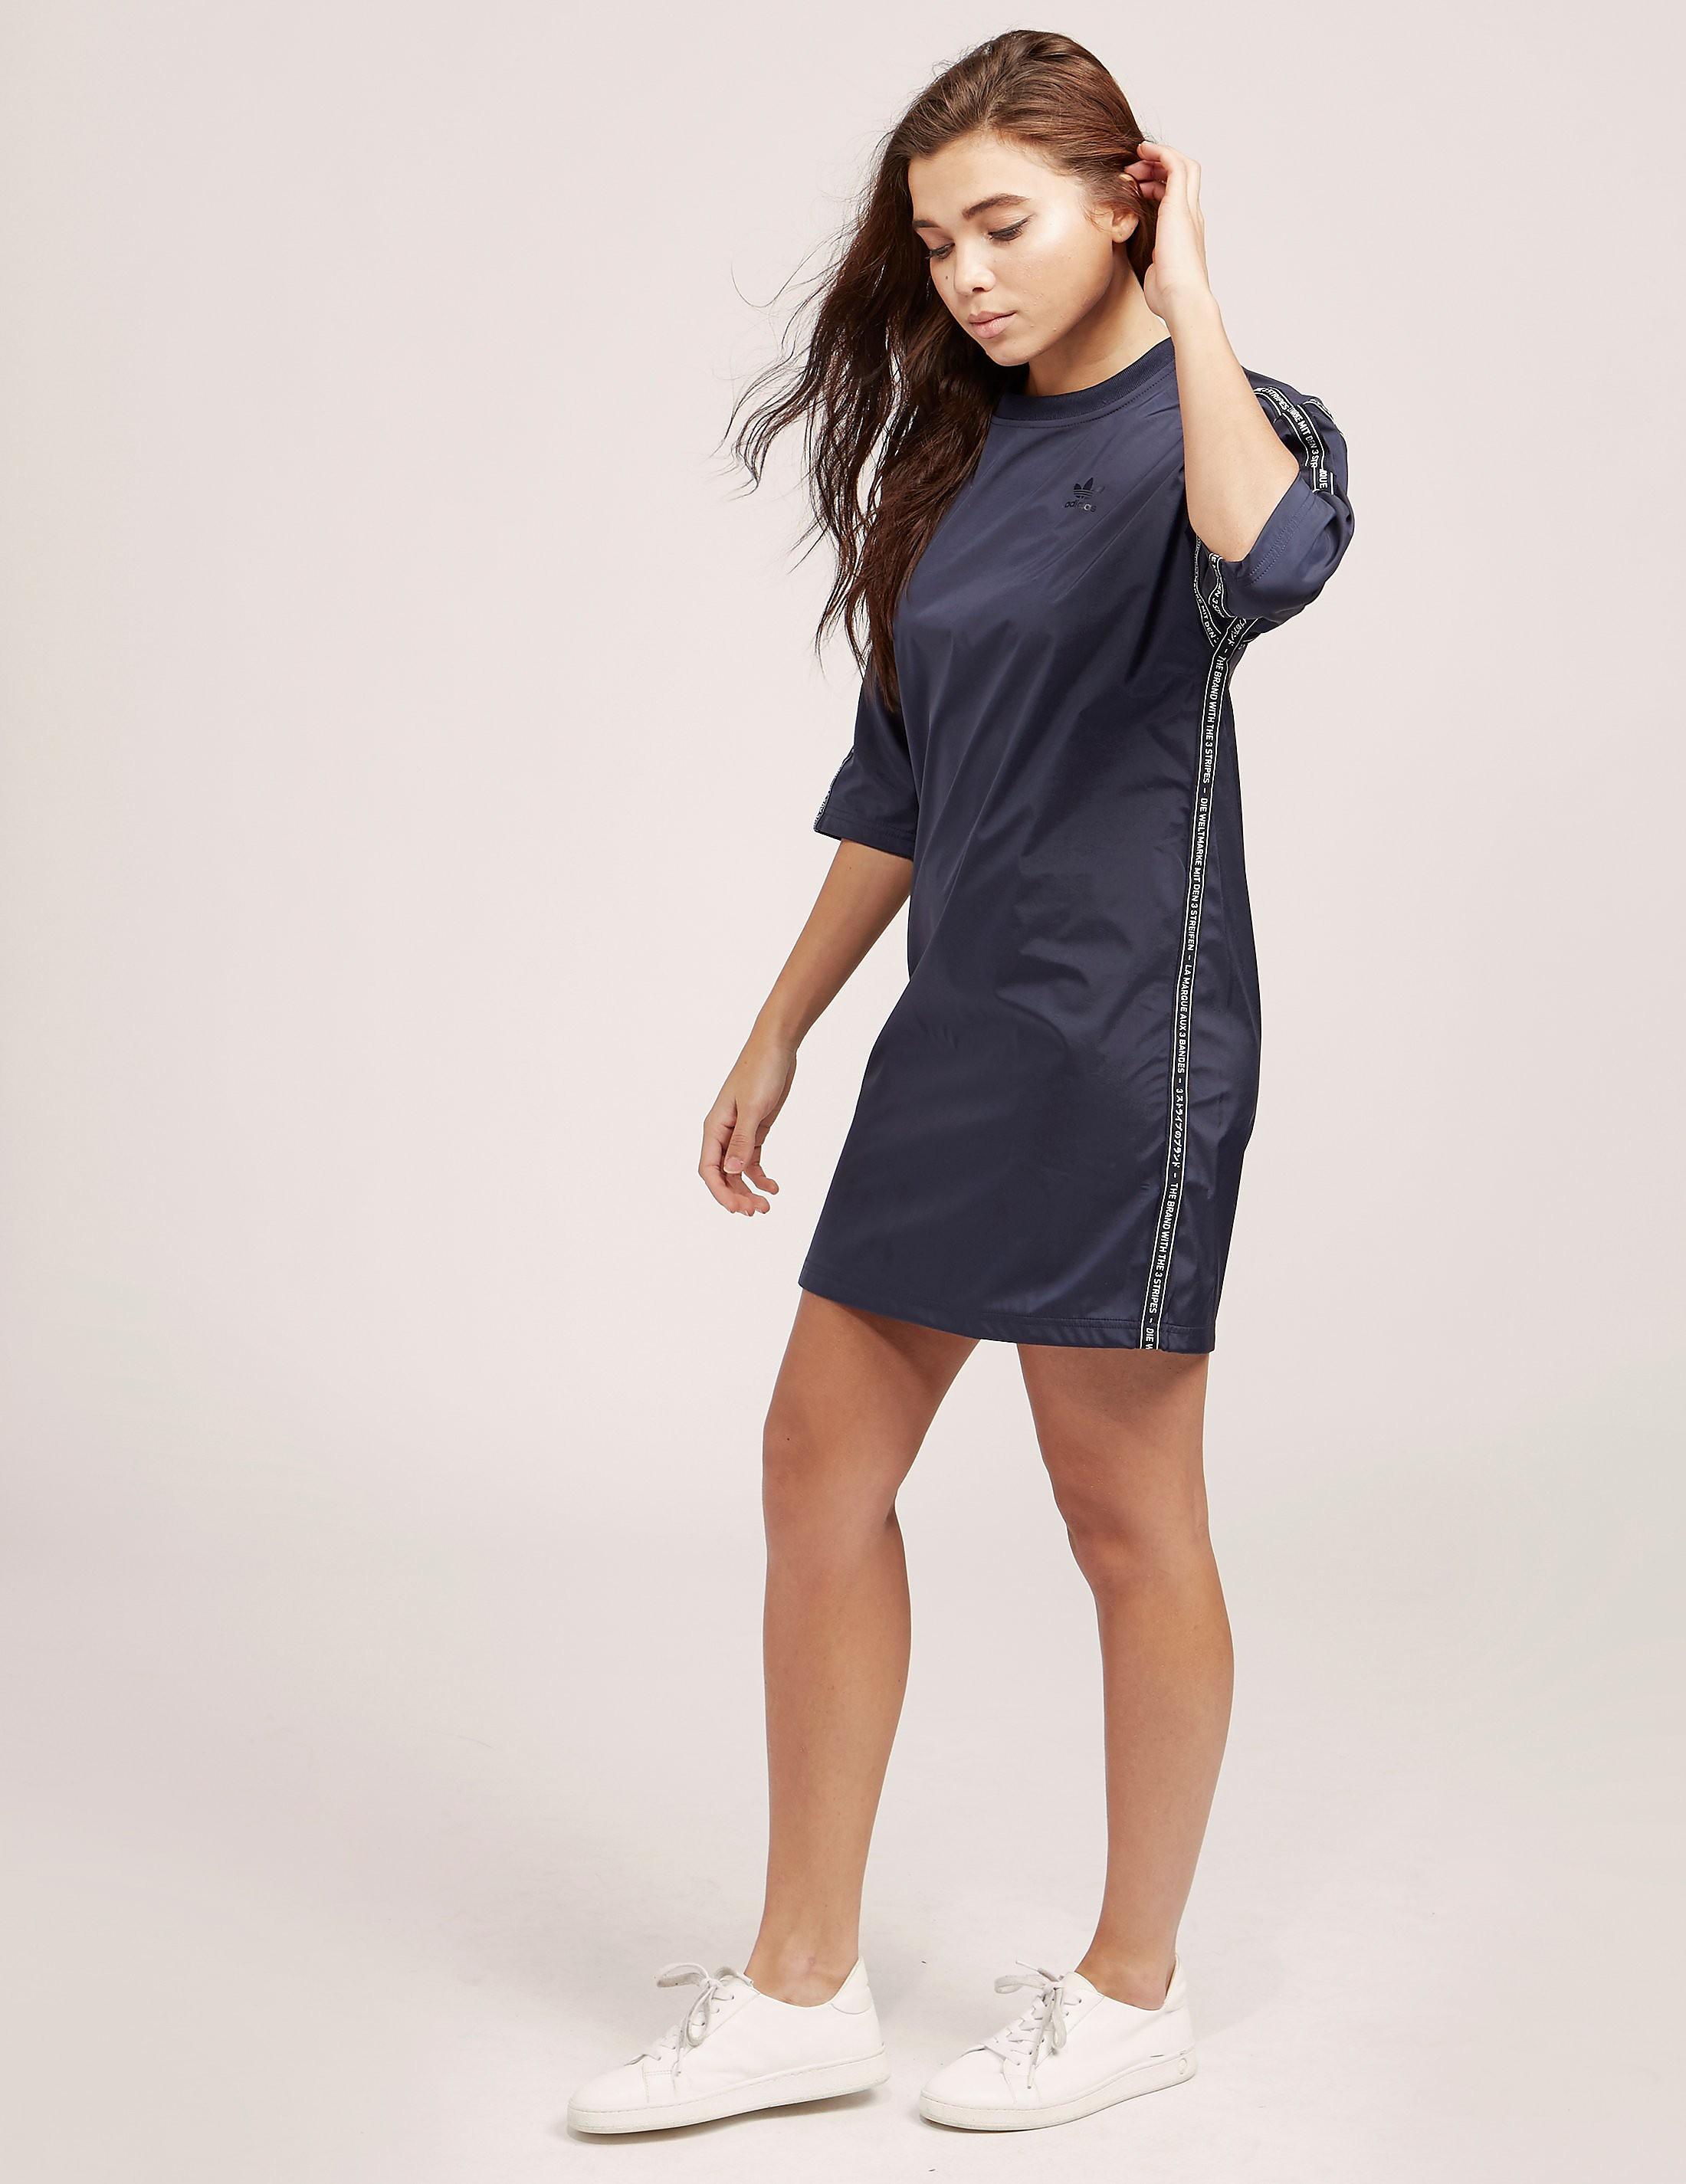 adidas Originals NMD Reversible Dress